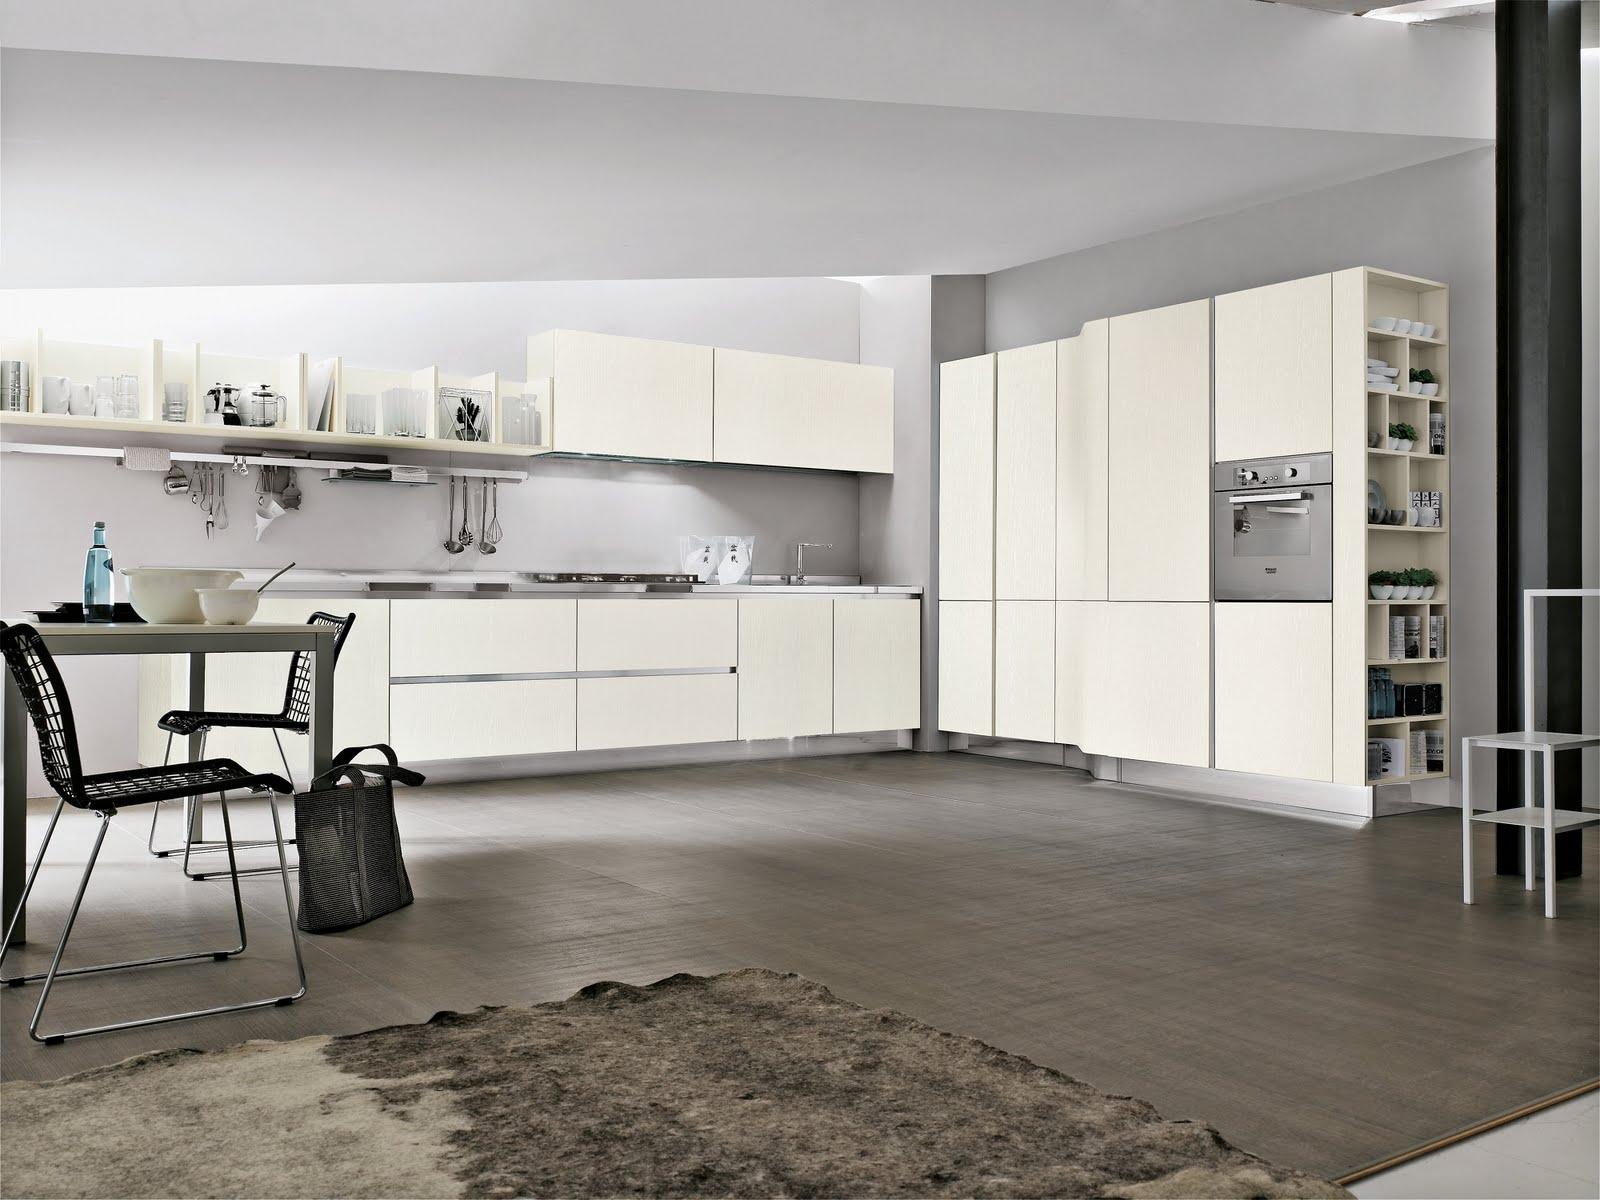 Le Migliori Cucine Moderne. Interesting Le Migliori Cucine Moderne ...